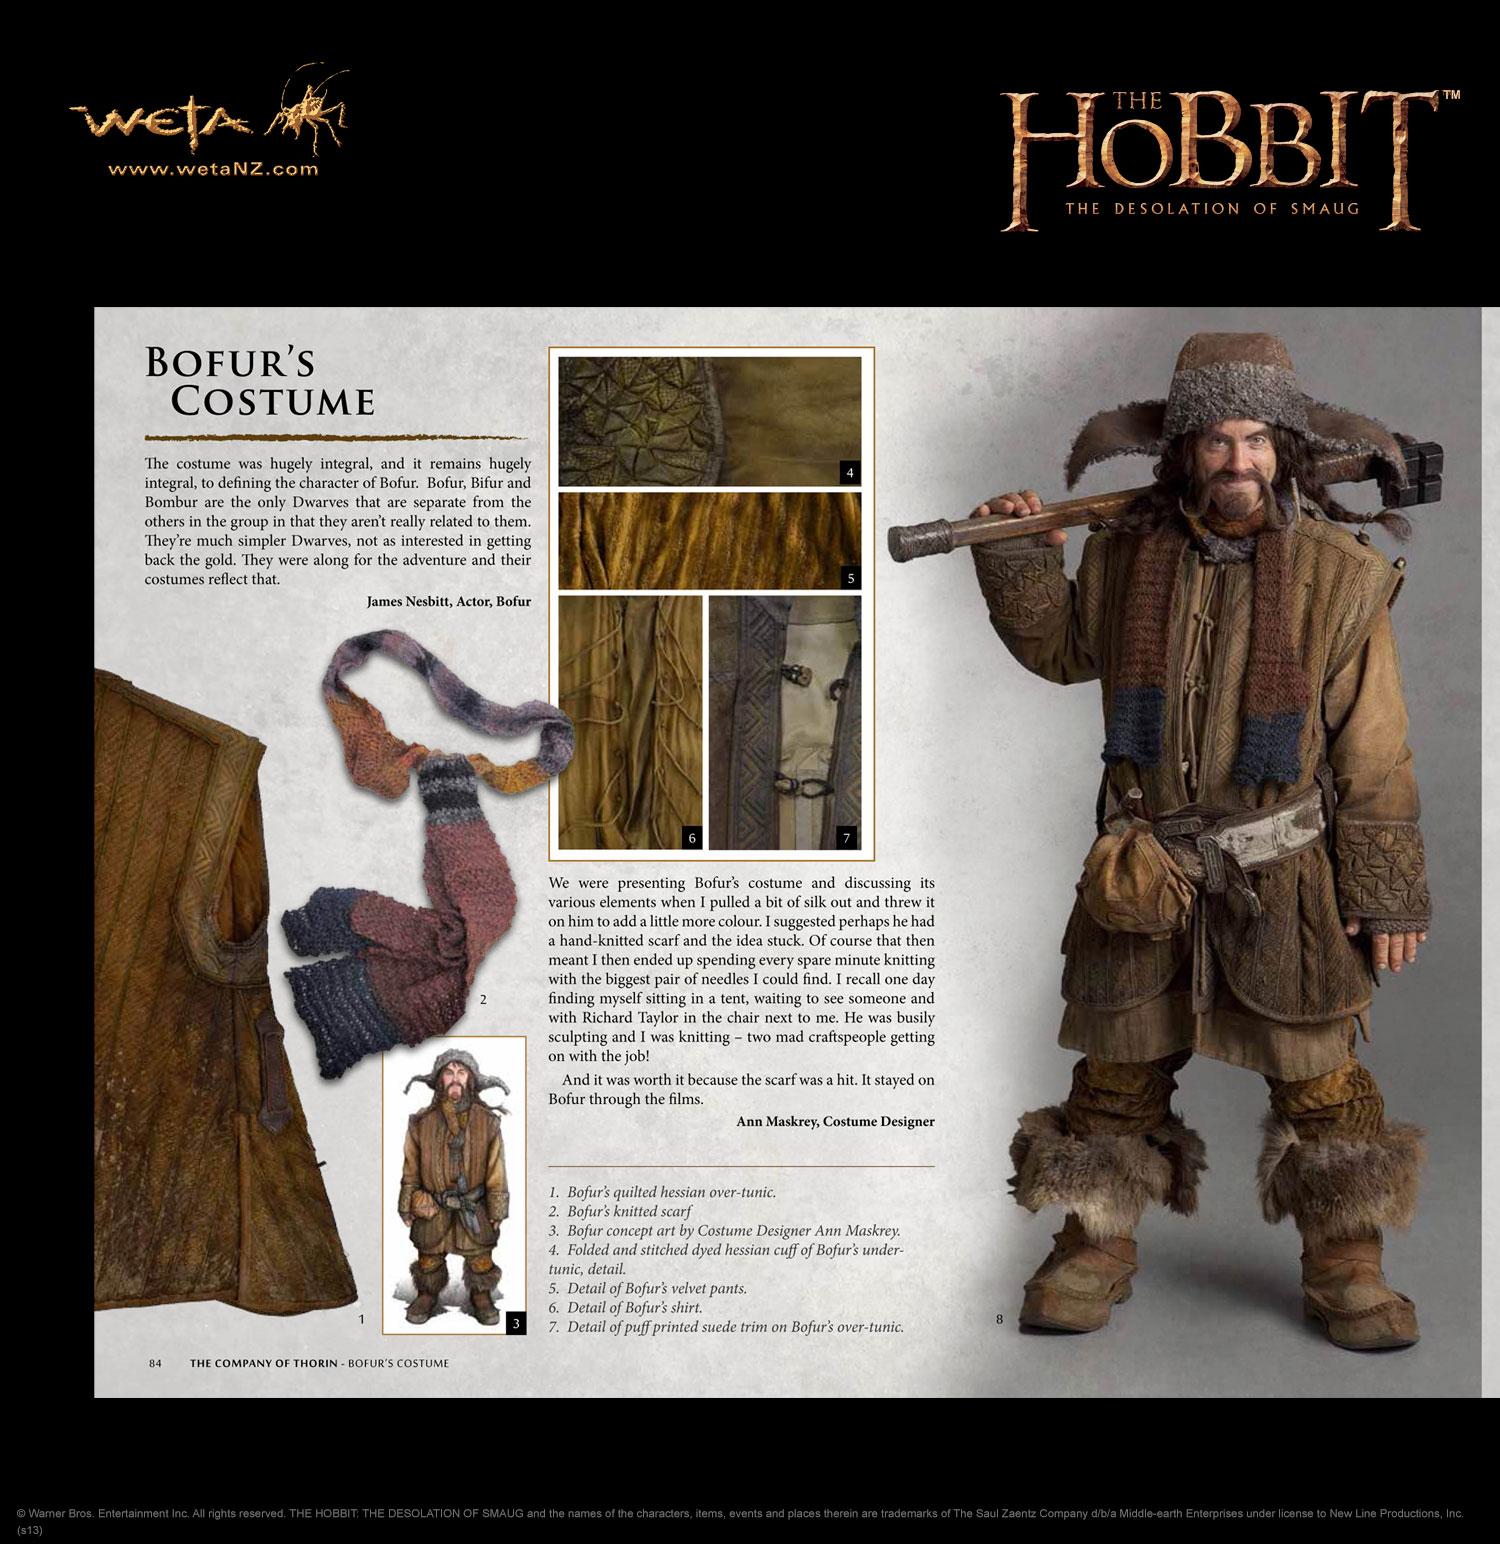 hobbit-chroniclesDoSCloaksDaggersi2